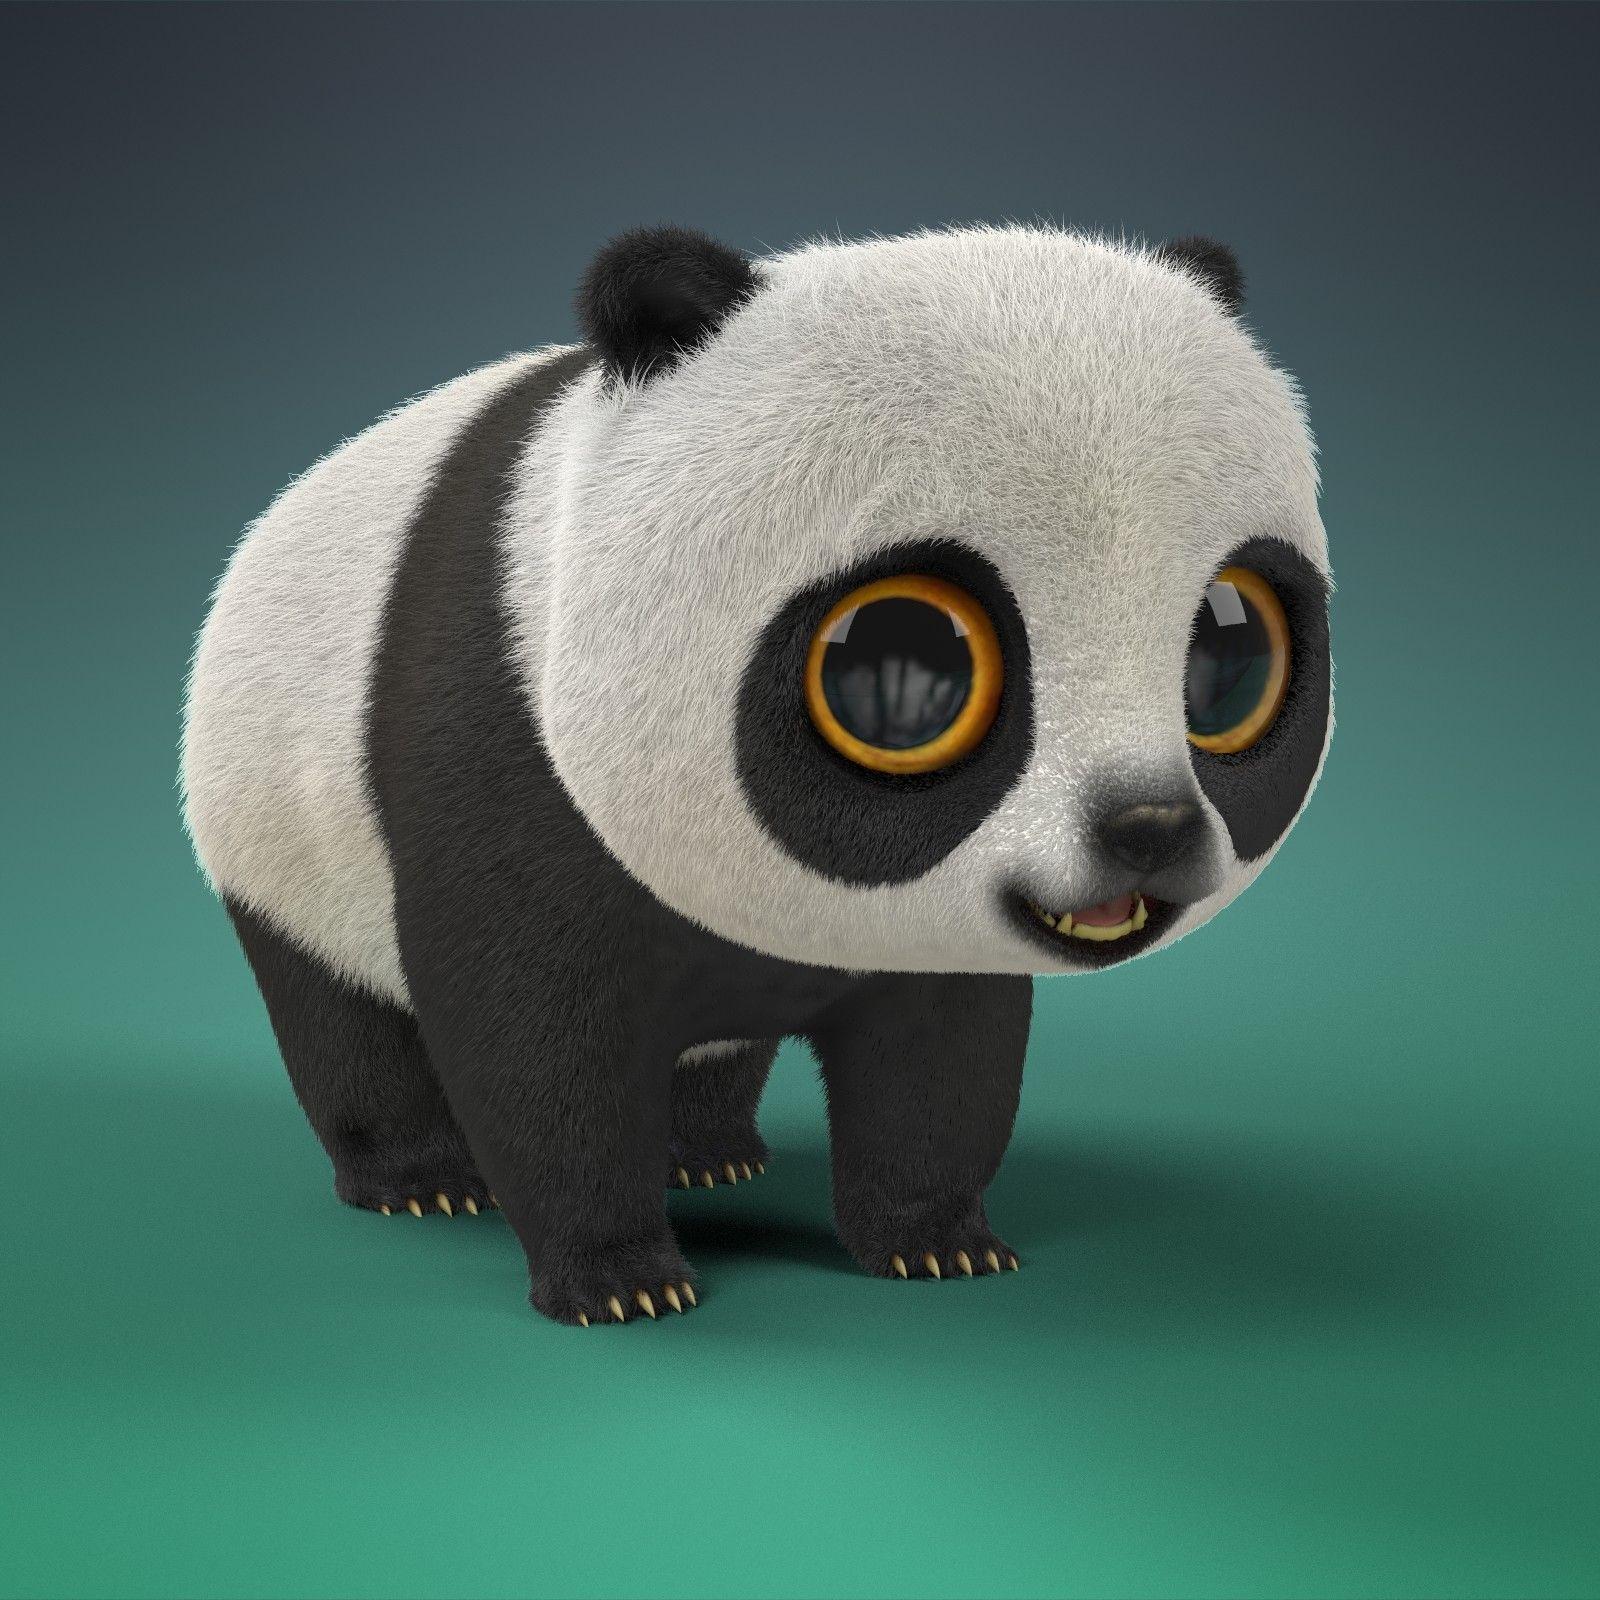 ArtStation Cartoon Panda, Hanna Shmakova